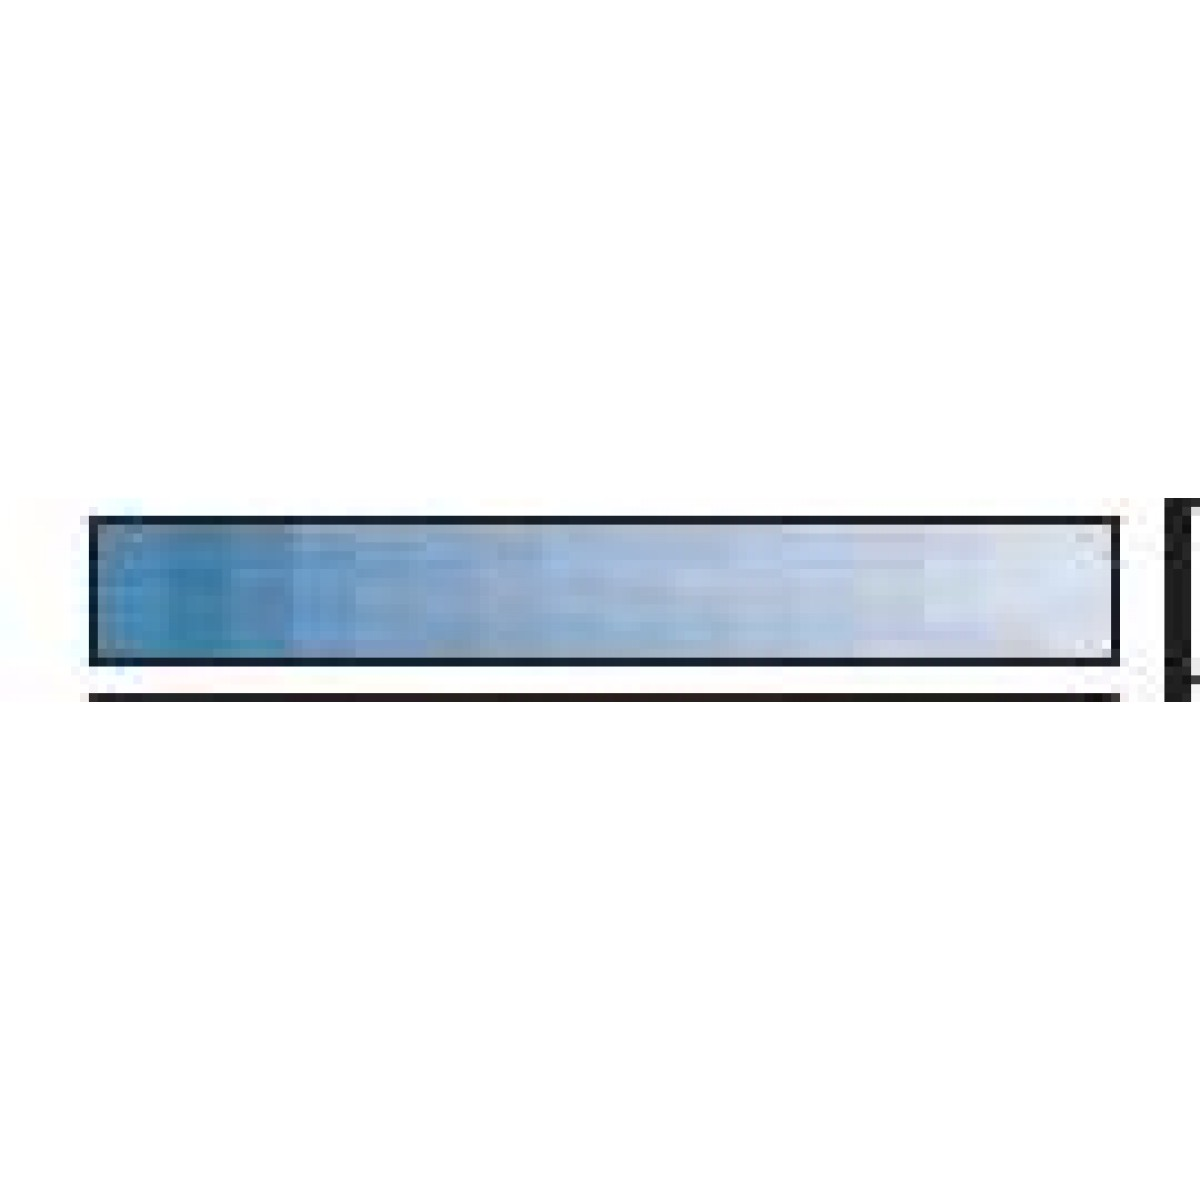 8567 Kunstnerkvalitet soft pastel Cyan